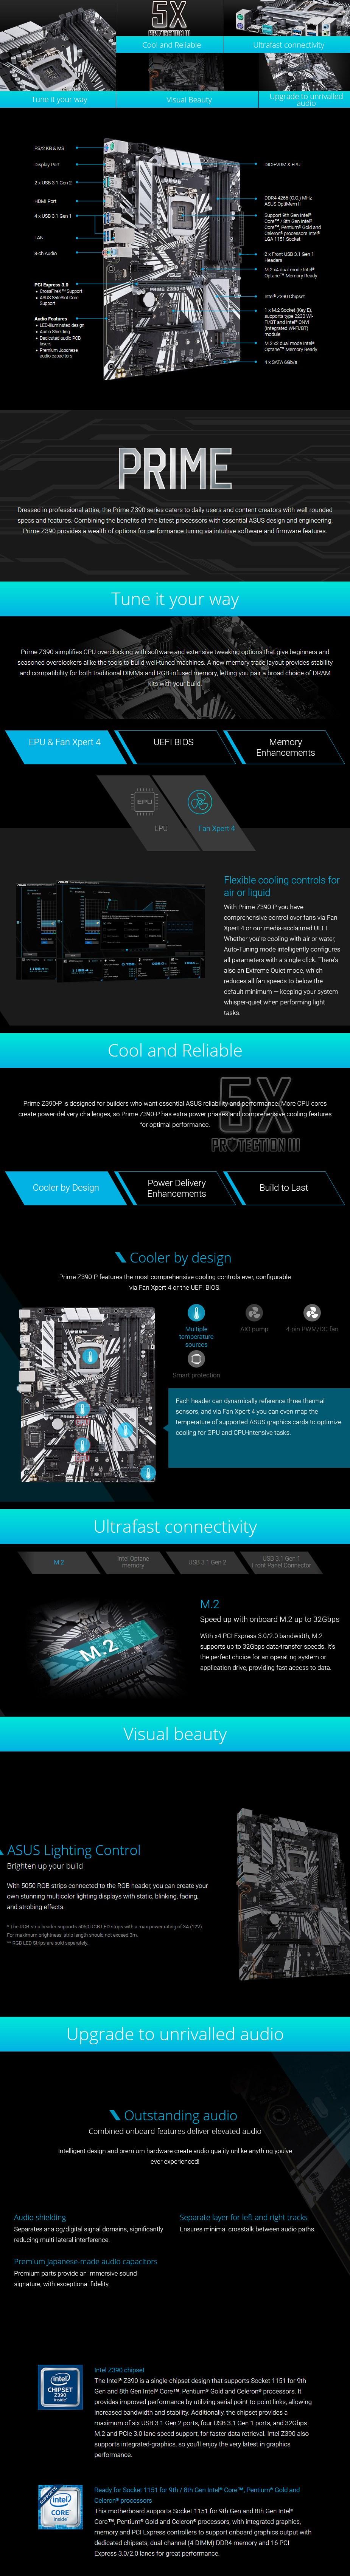 ASUS PRIME Z390-P LGA 1151 ATX Motherboard - Desktop Overview 1